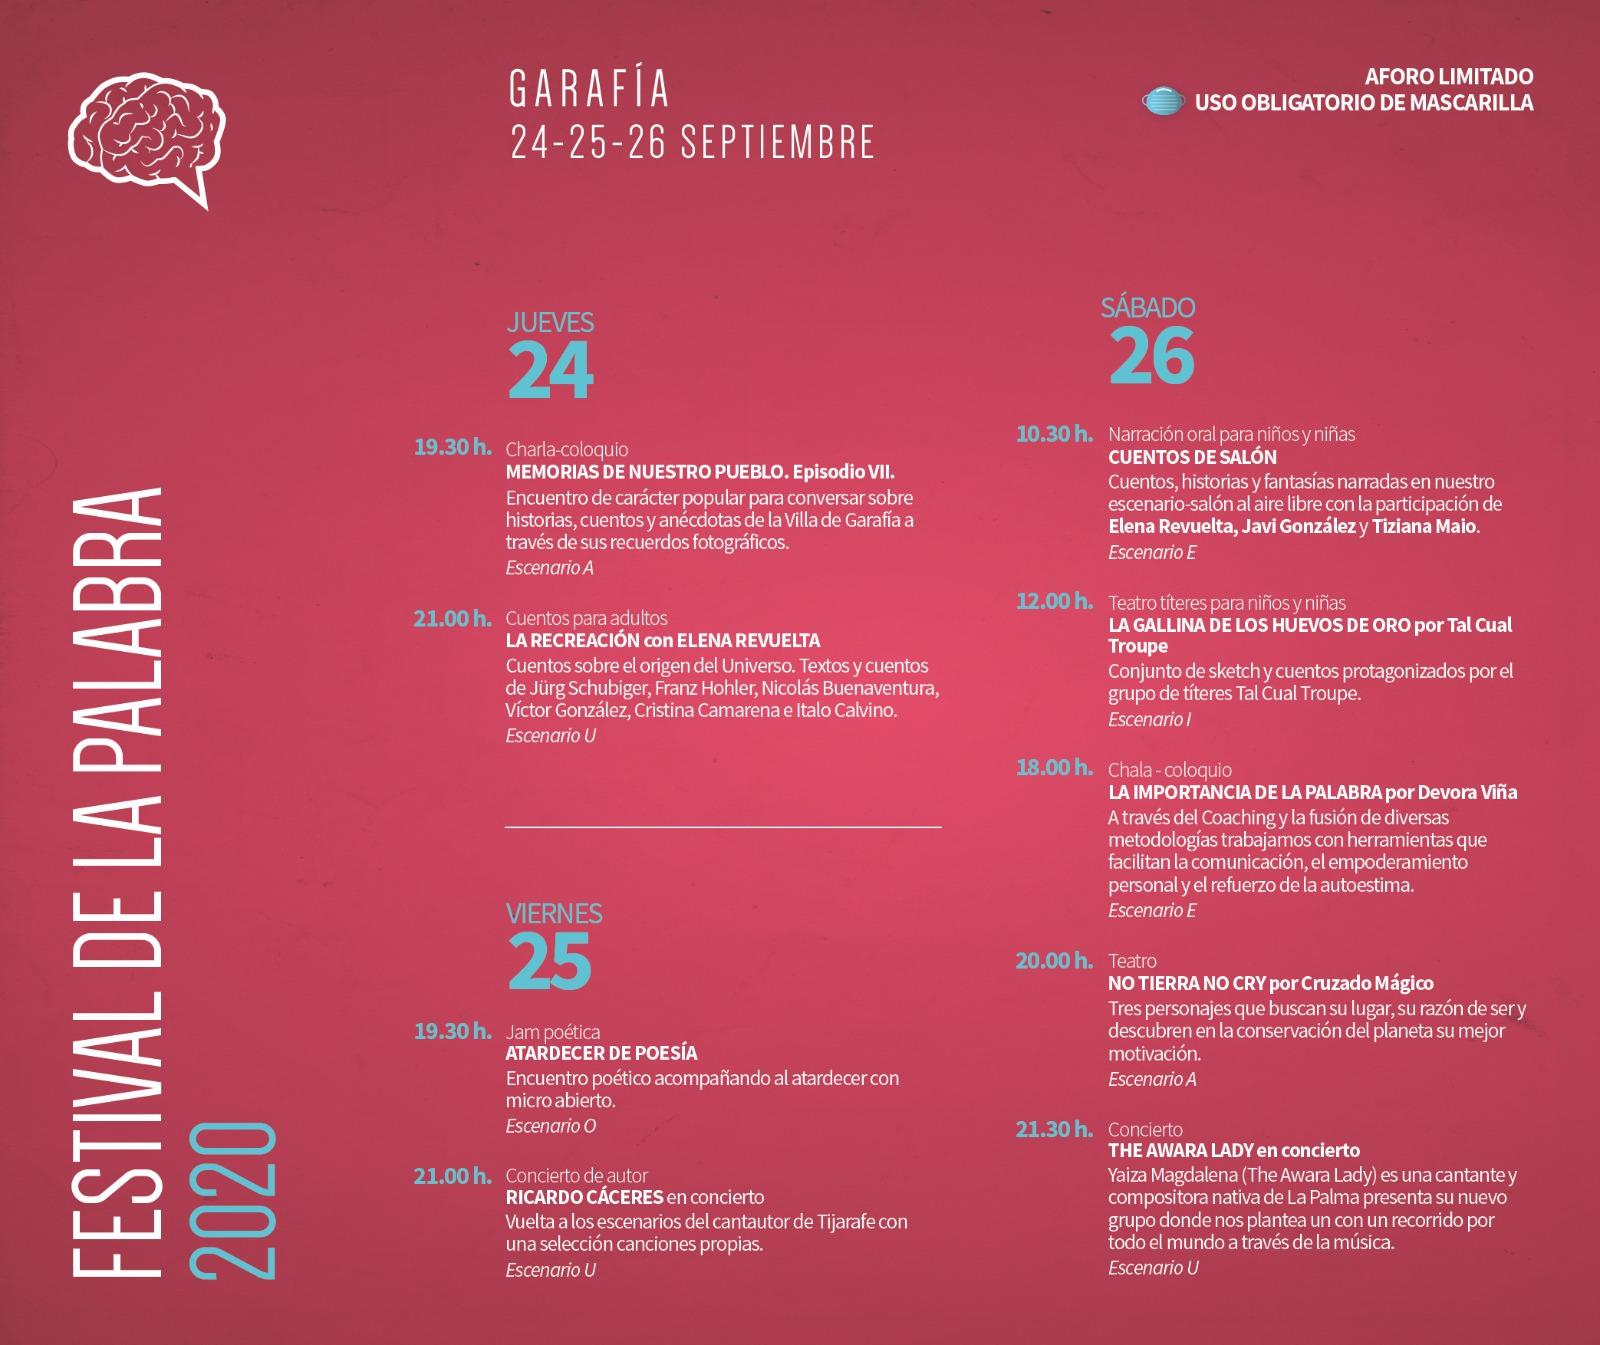 24-25-26-9-2020-festival-de-la-palabra